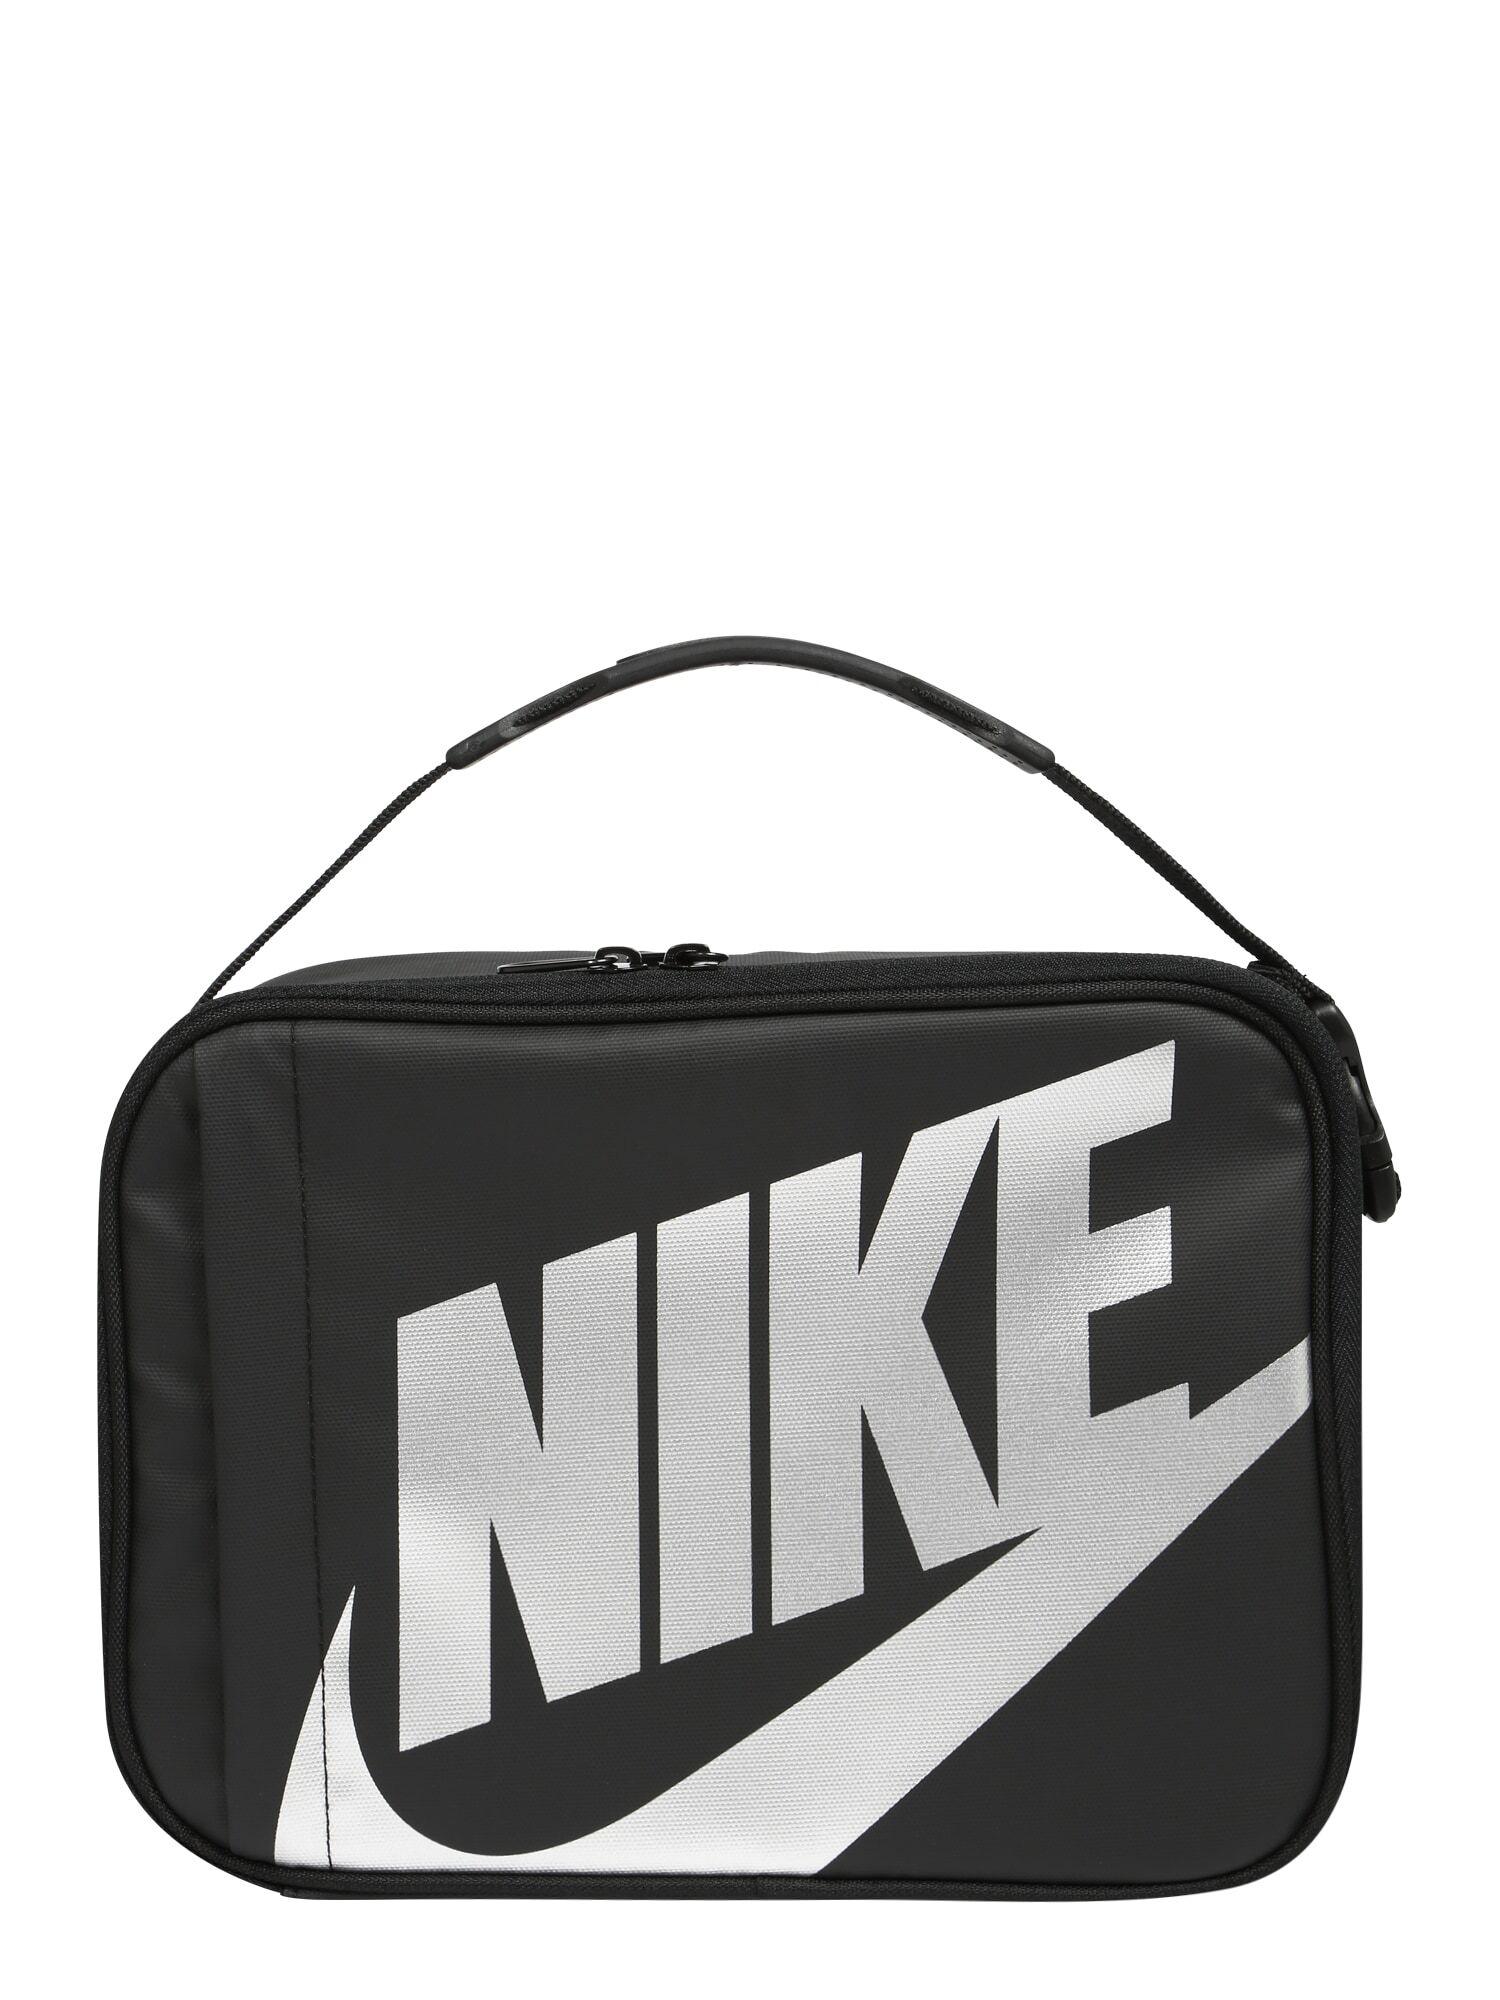 Nike Sportswear Sac  - Noir - Taille: One Size - boy